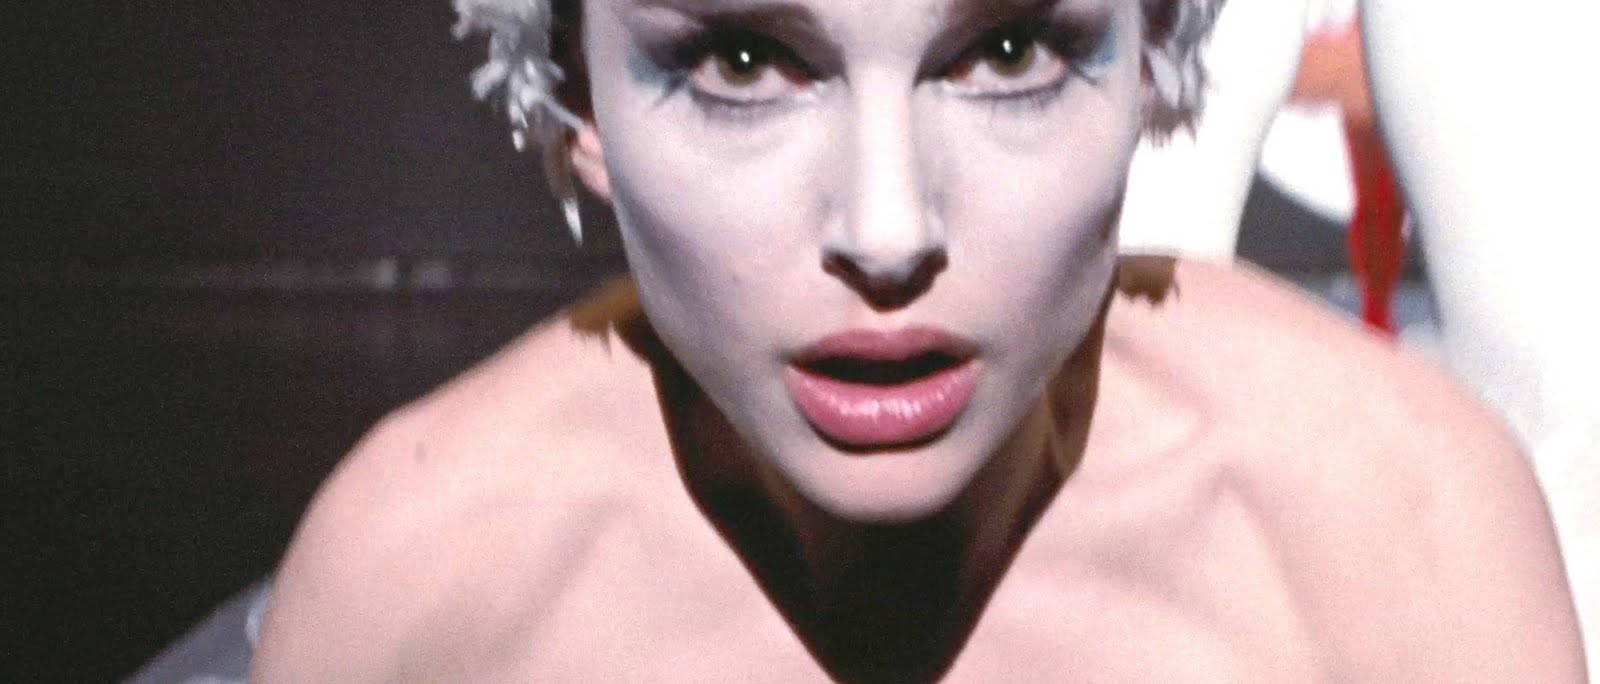 black swan movie images - photo #19